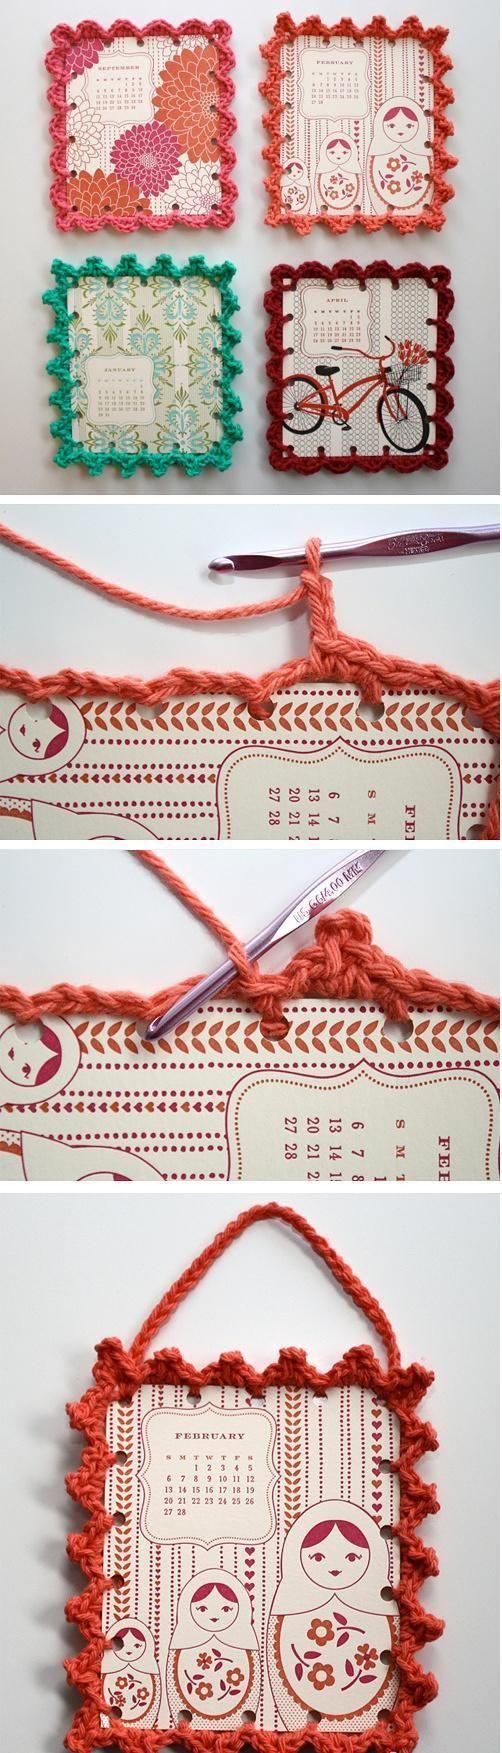 Crochet edged cards - One sheepish girl http://onesheepishgirl.blogspot.be/2012/01/adding-crochet-edge-to-paper-valentines.html